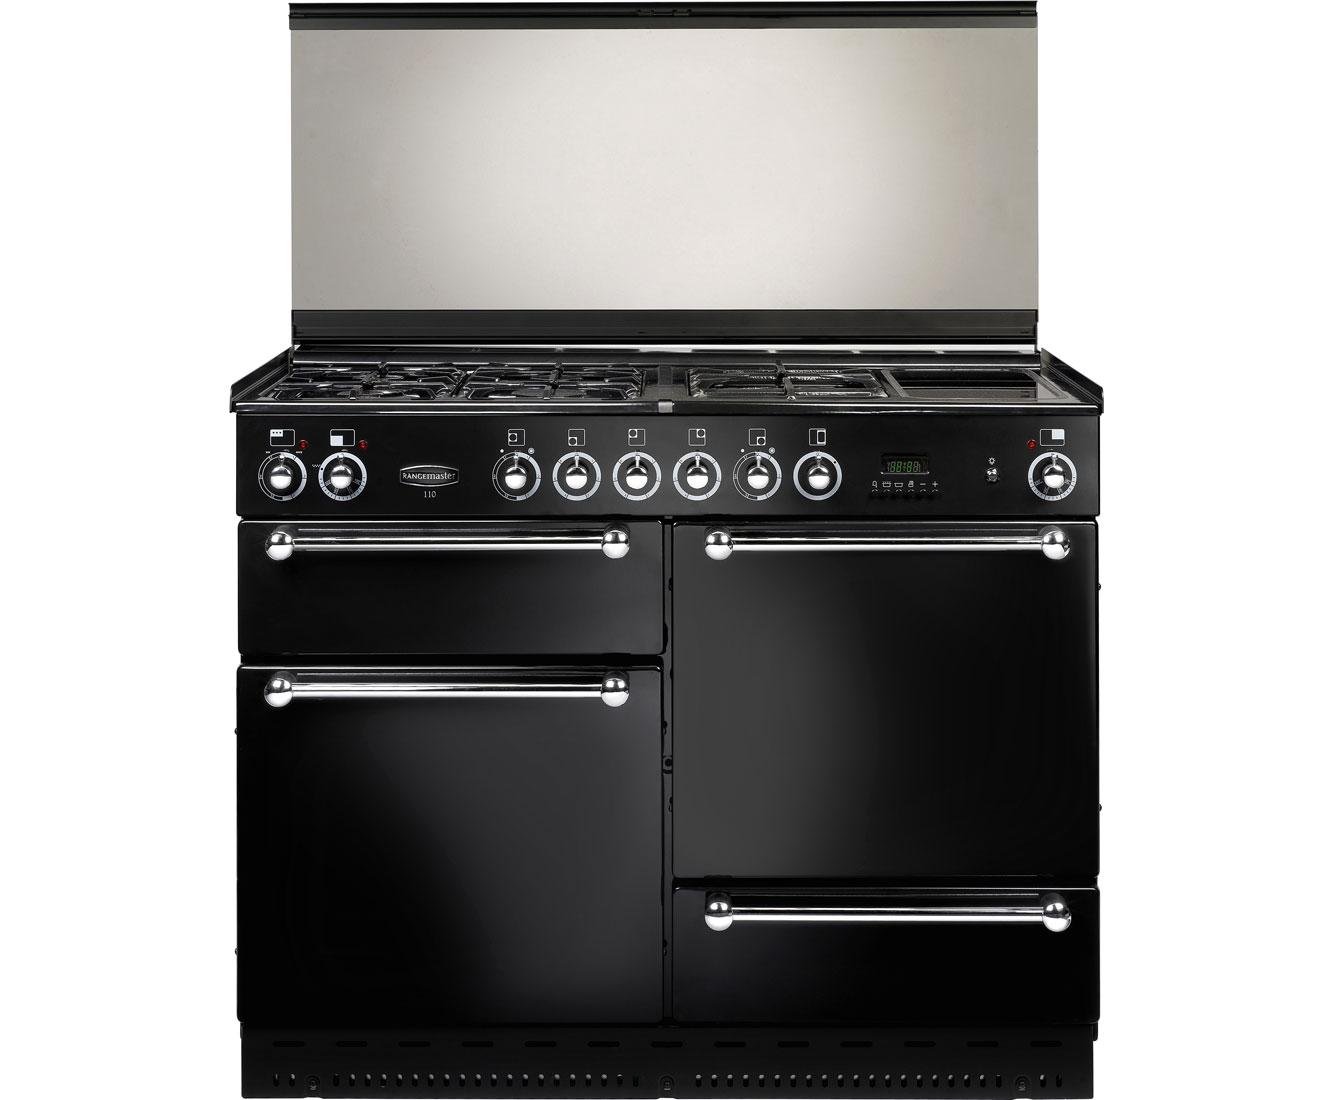 Rangemaster RMS110NGFBLSDC Free Standing Range Cooker in Black  Chrome